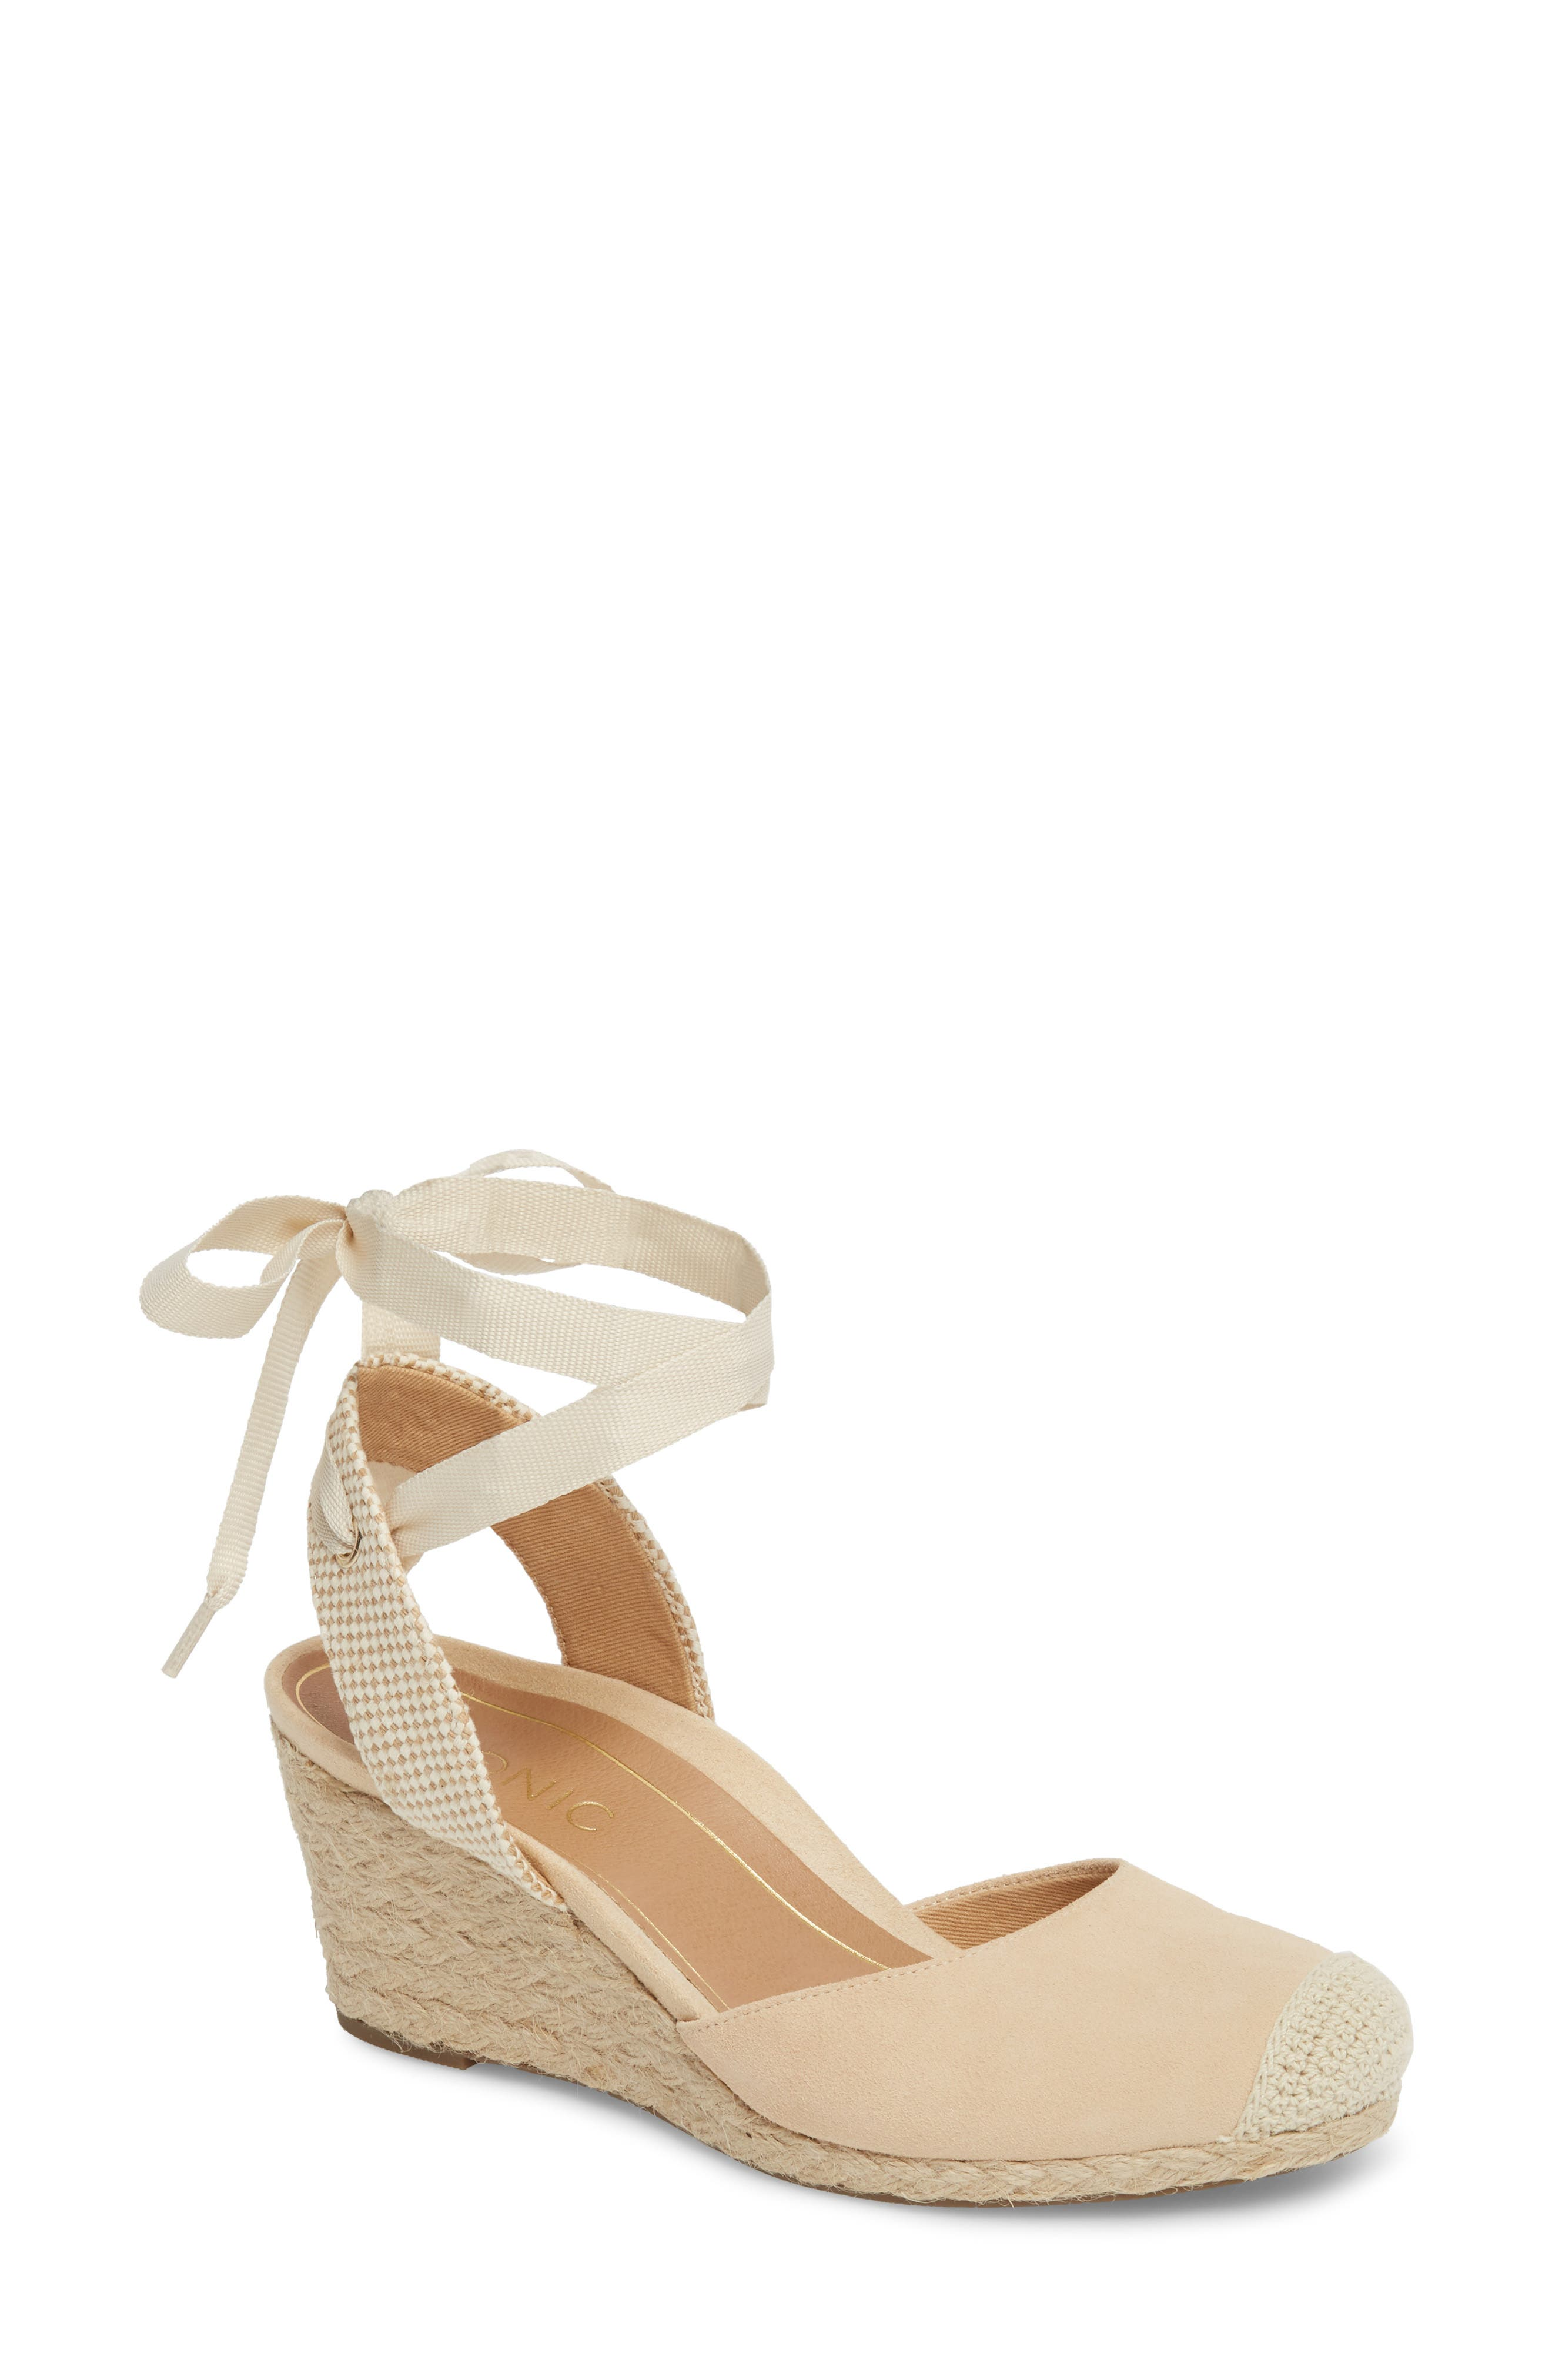 Vionic Maris Orthaheel® Espadrille Wedge Sandal (Women)